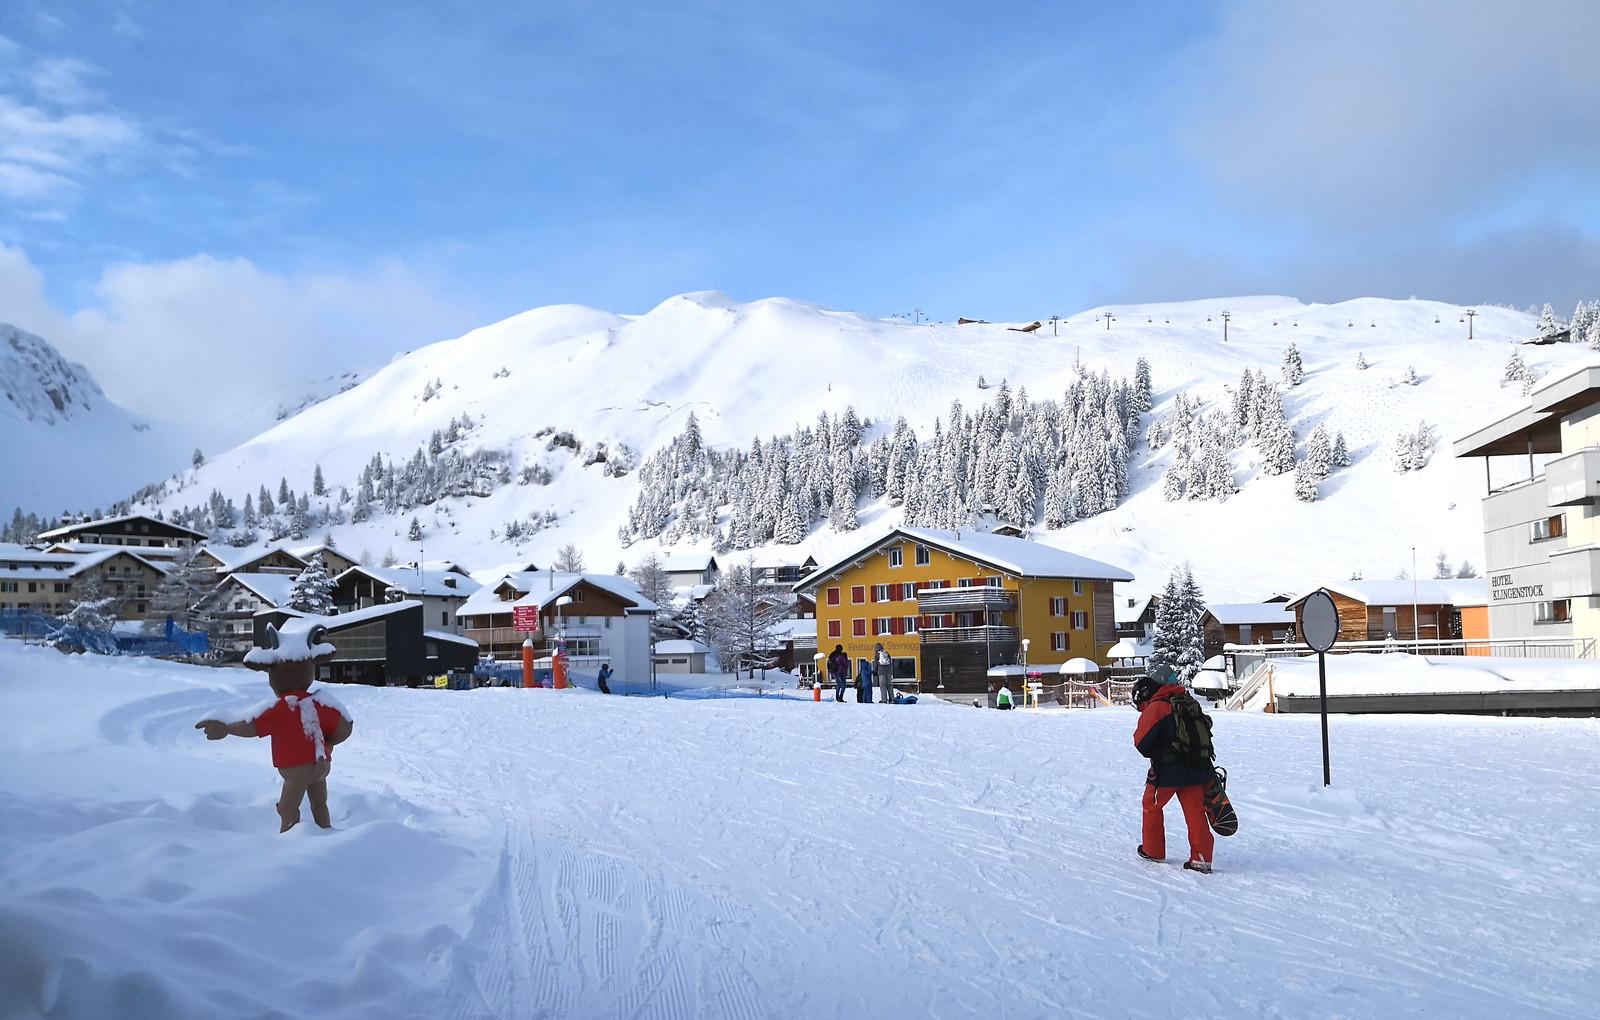 Ski village of Stoos